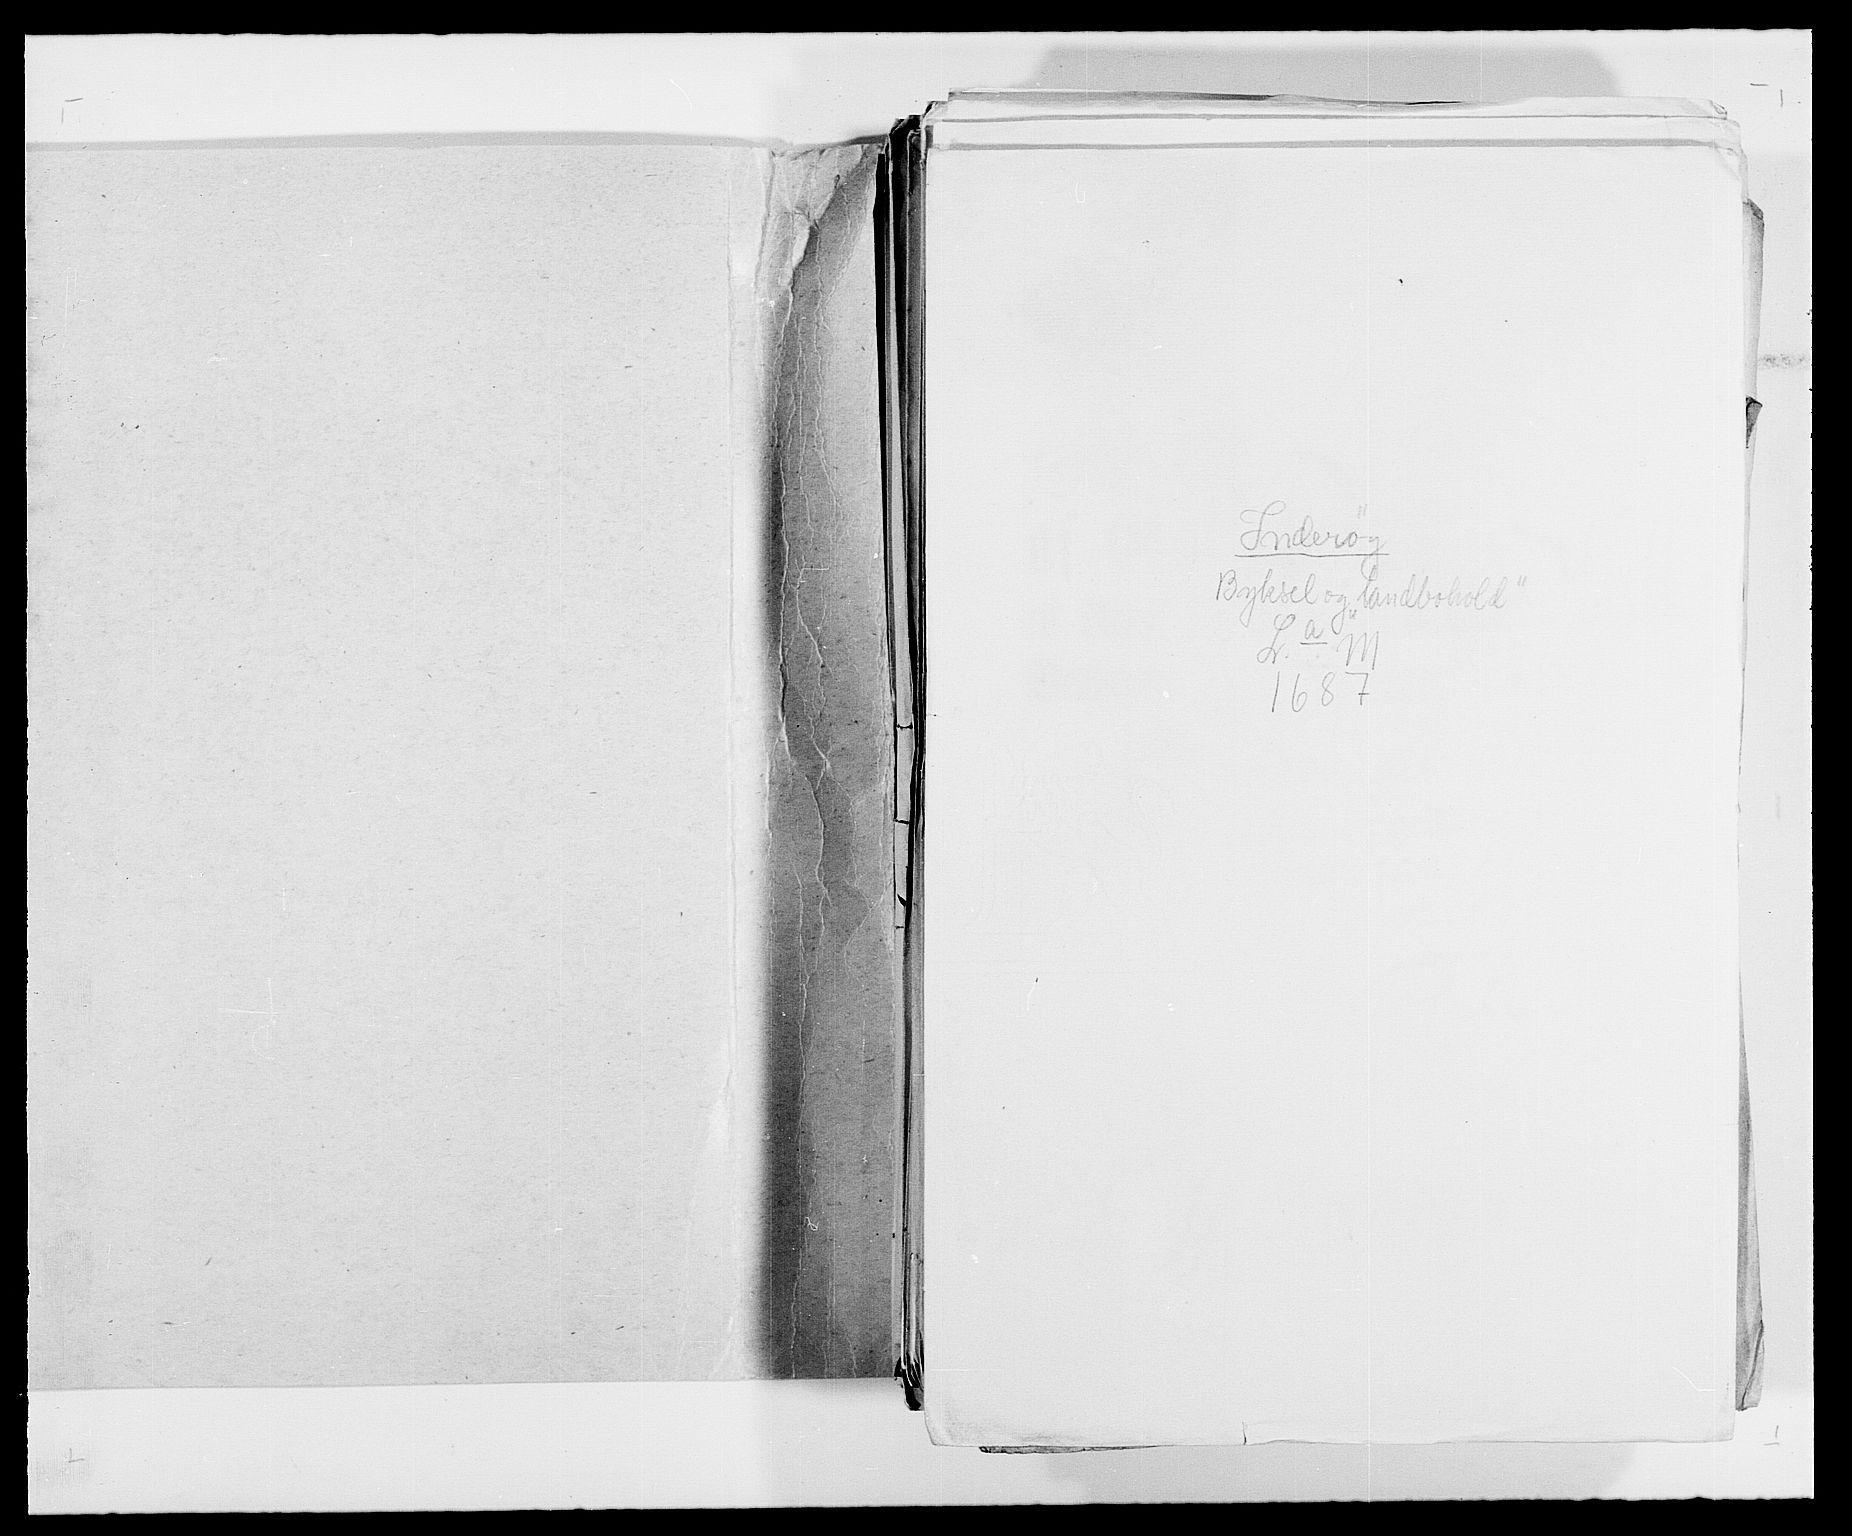 RA, Rentekammeret inntil 1814, Reviderte regnskaper, Fogderegnskap, R63/L4306: Fogderegnskap Inderøy, 1687-1689, s. 167